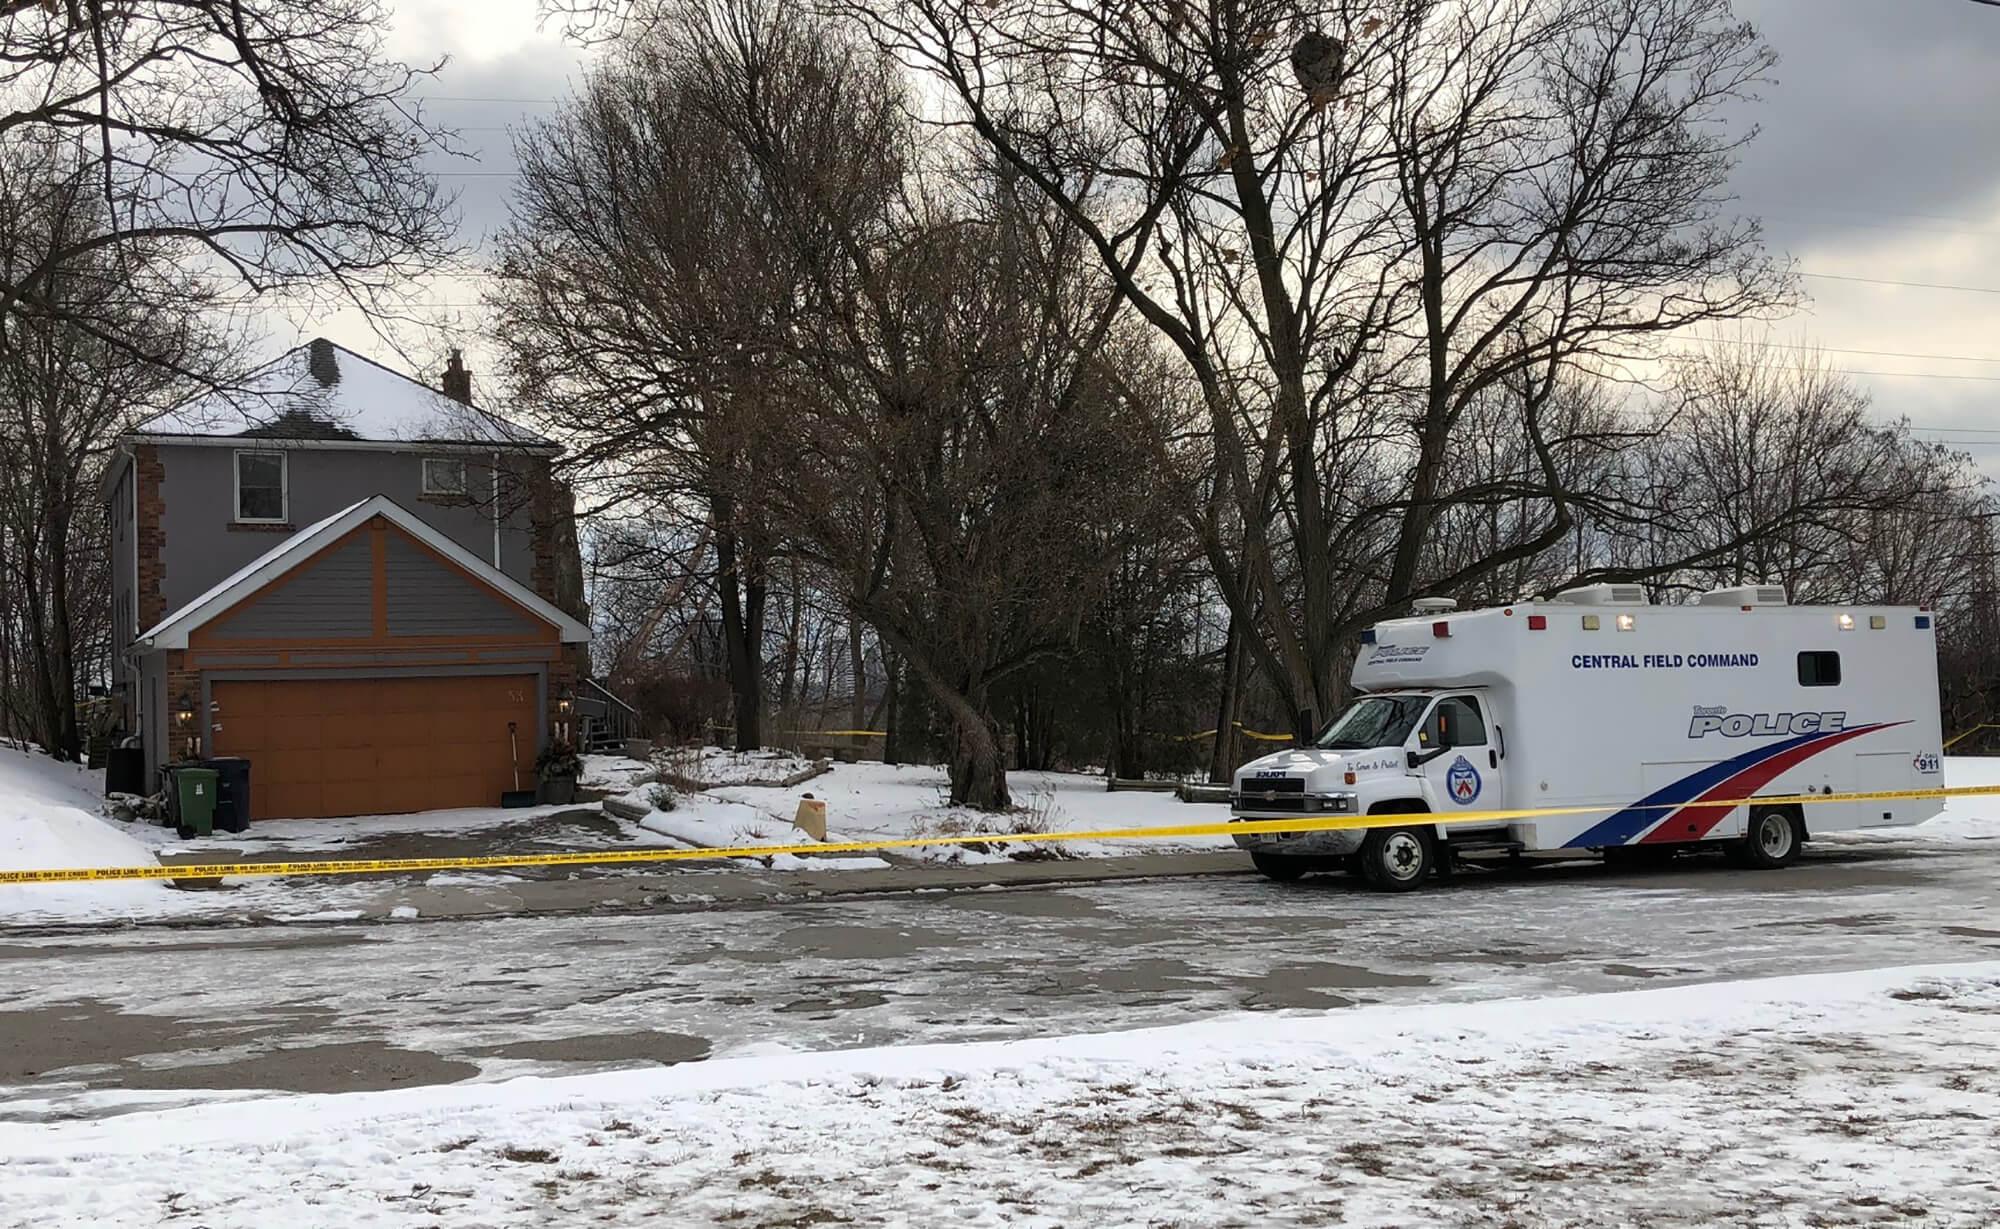 Bruce McArthur, el jardinero asesino de Toronto, mató a 8 personas